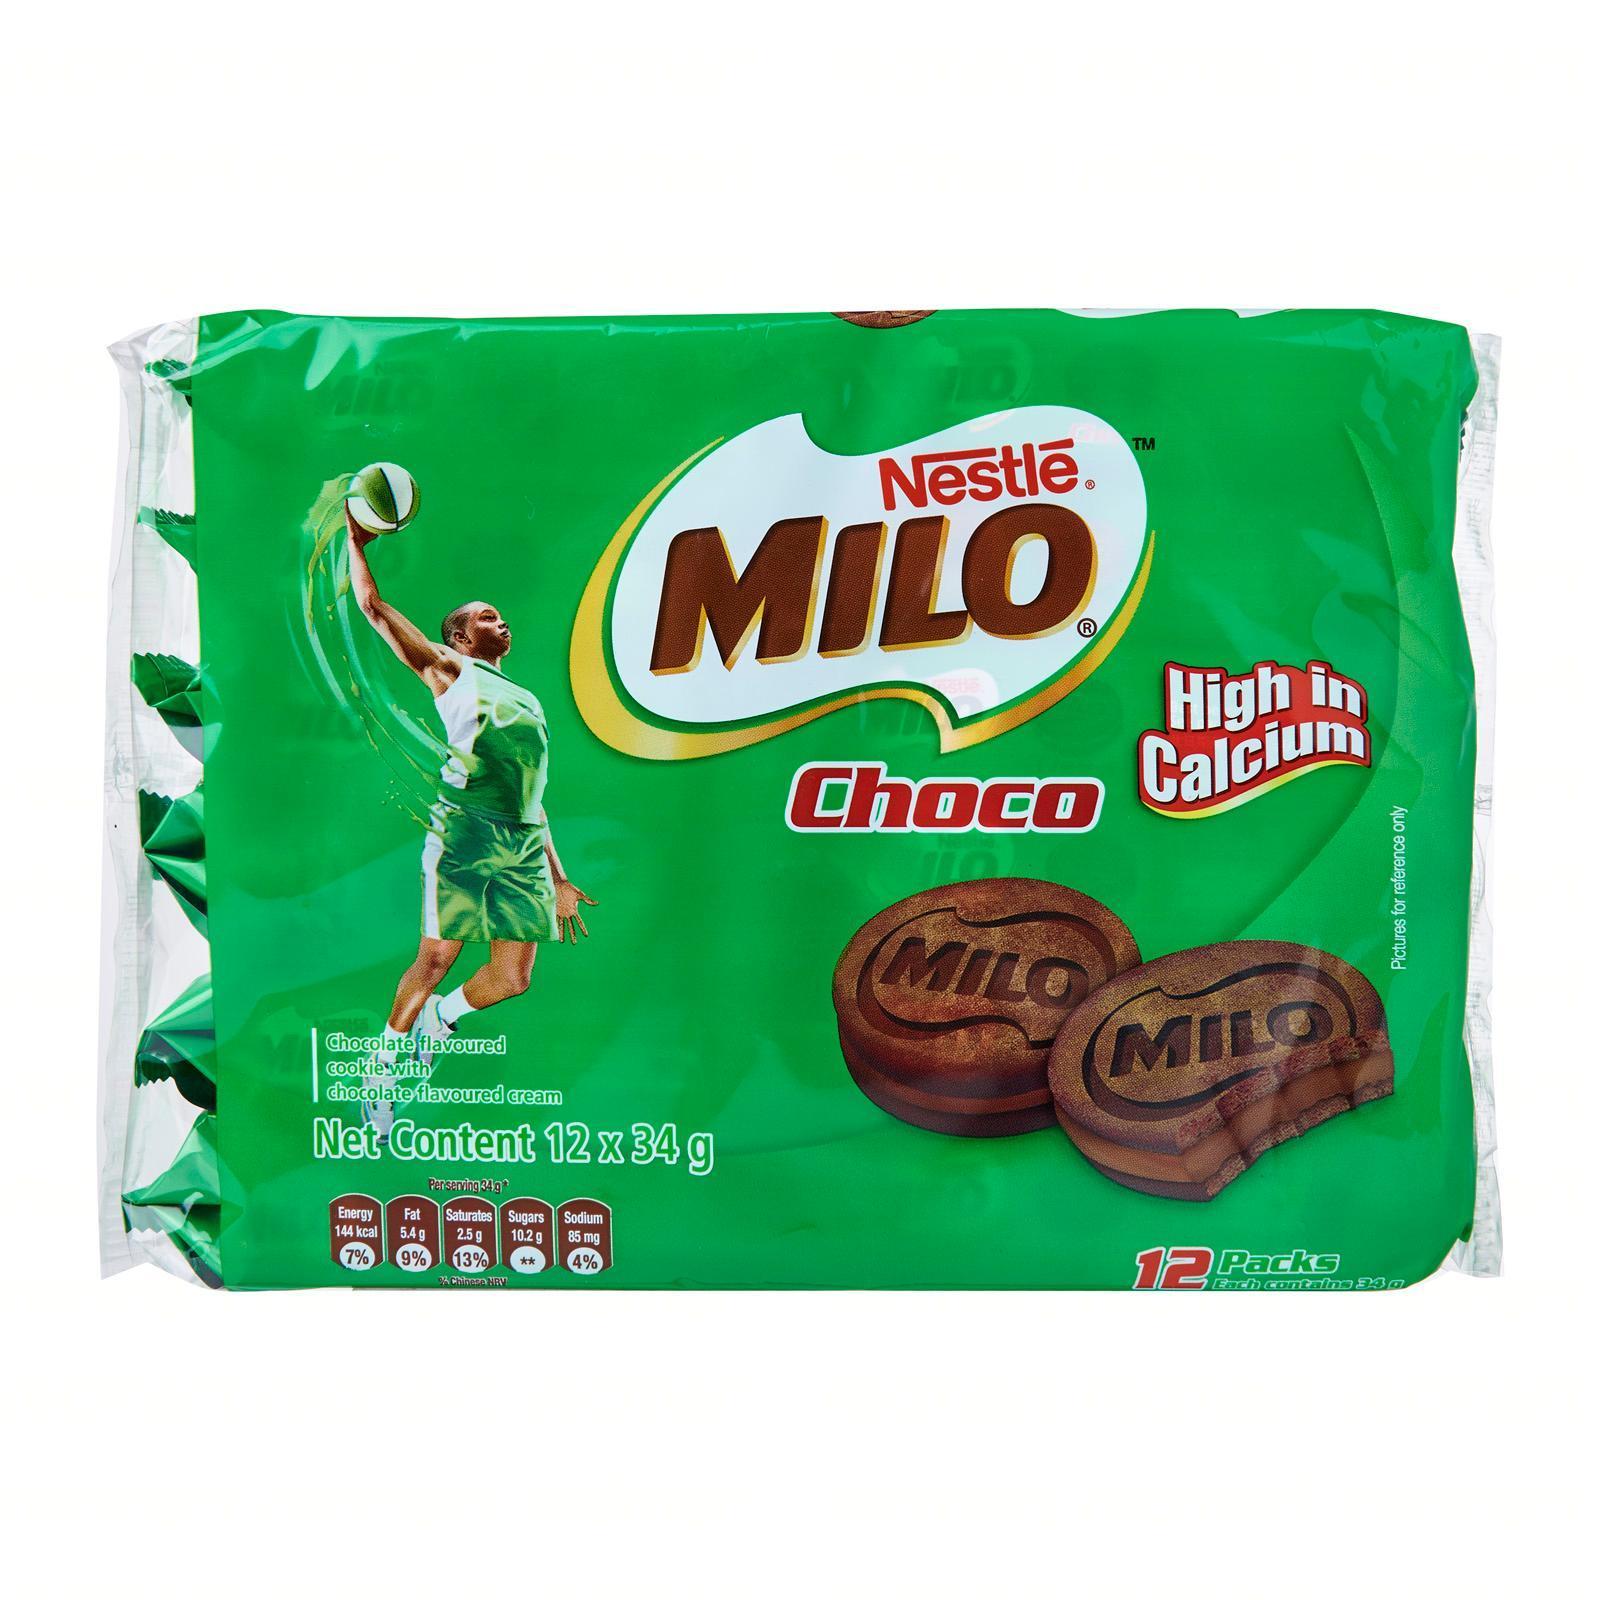 MILO Biscuit Sandwich Cookie - 12 Piece